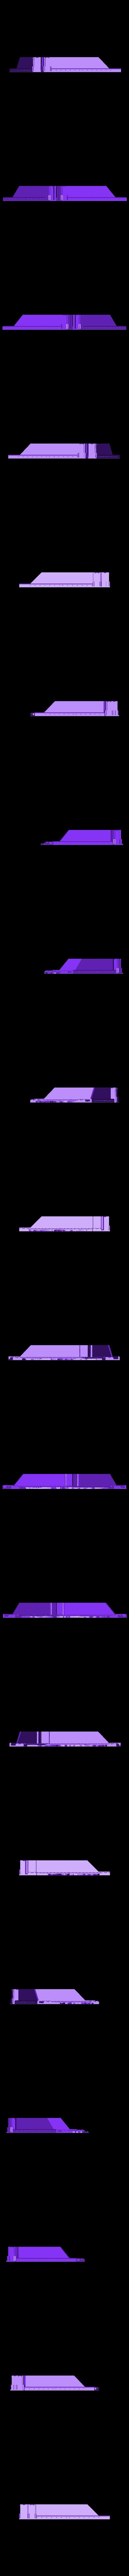 fixation_bottom_2nd_floor.stl Download free STL file Damocles kickstarter modular industrial buildings sample • 3D print design, Alario